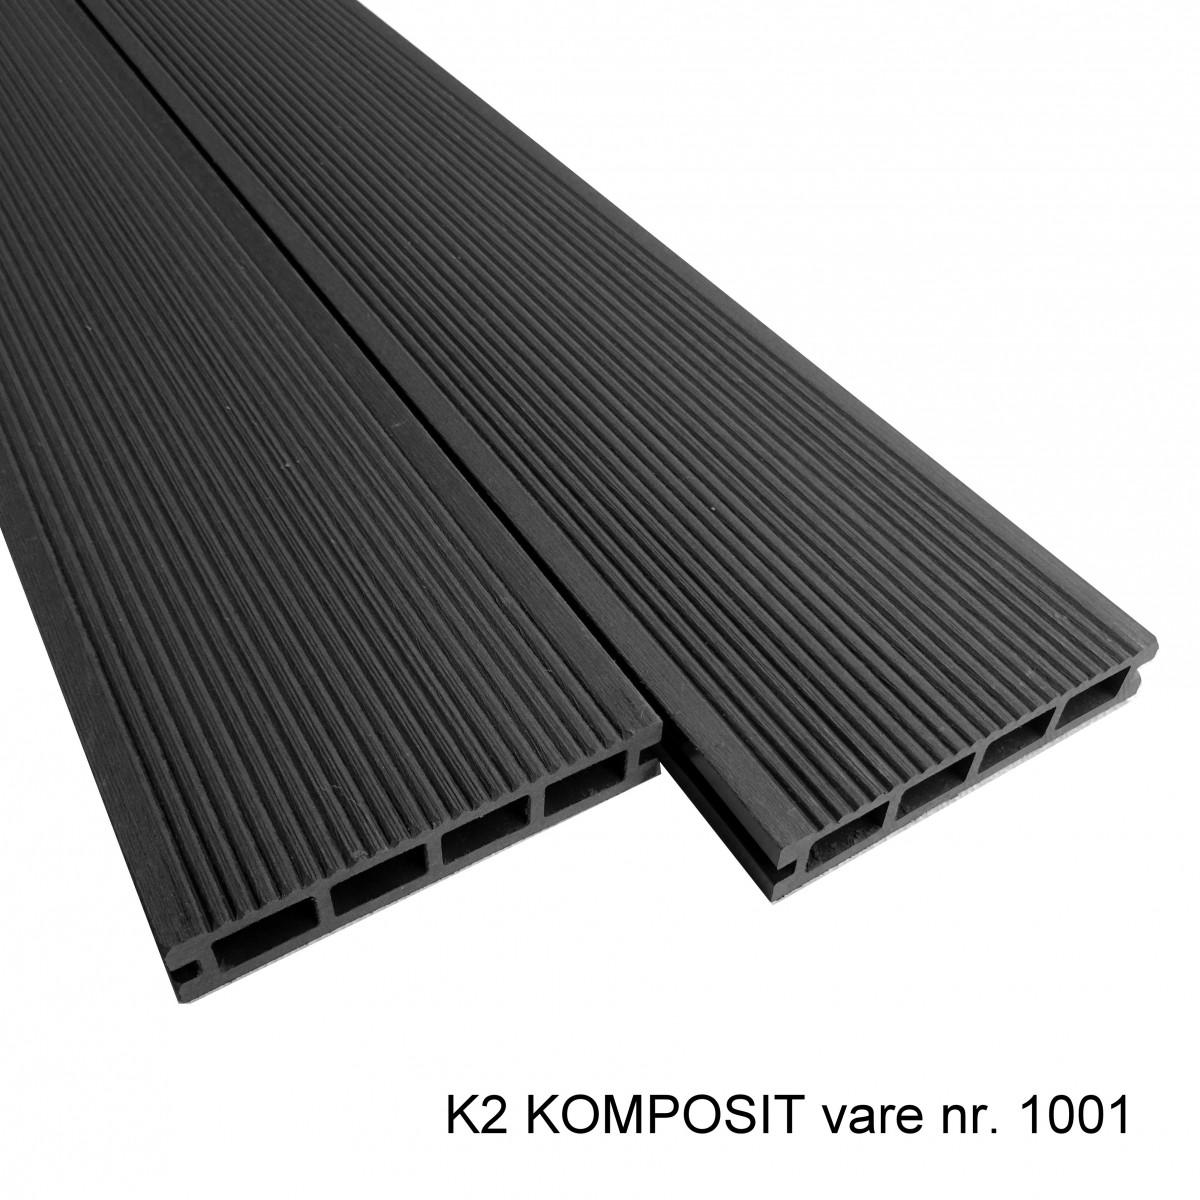 Picture of: K2 Komposit Terrassebraedder Grasort S 25x135x2220 Mm Borstet Rillet Glat K2 Komposit